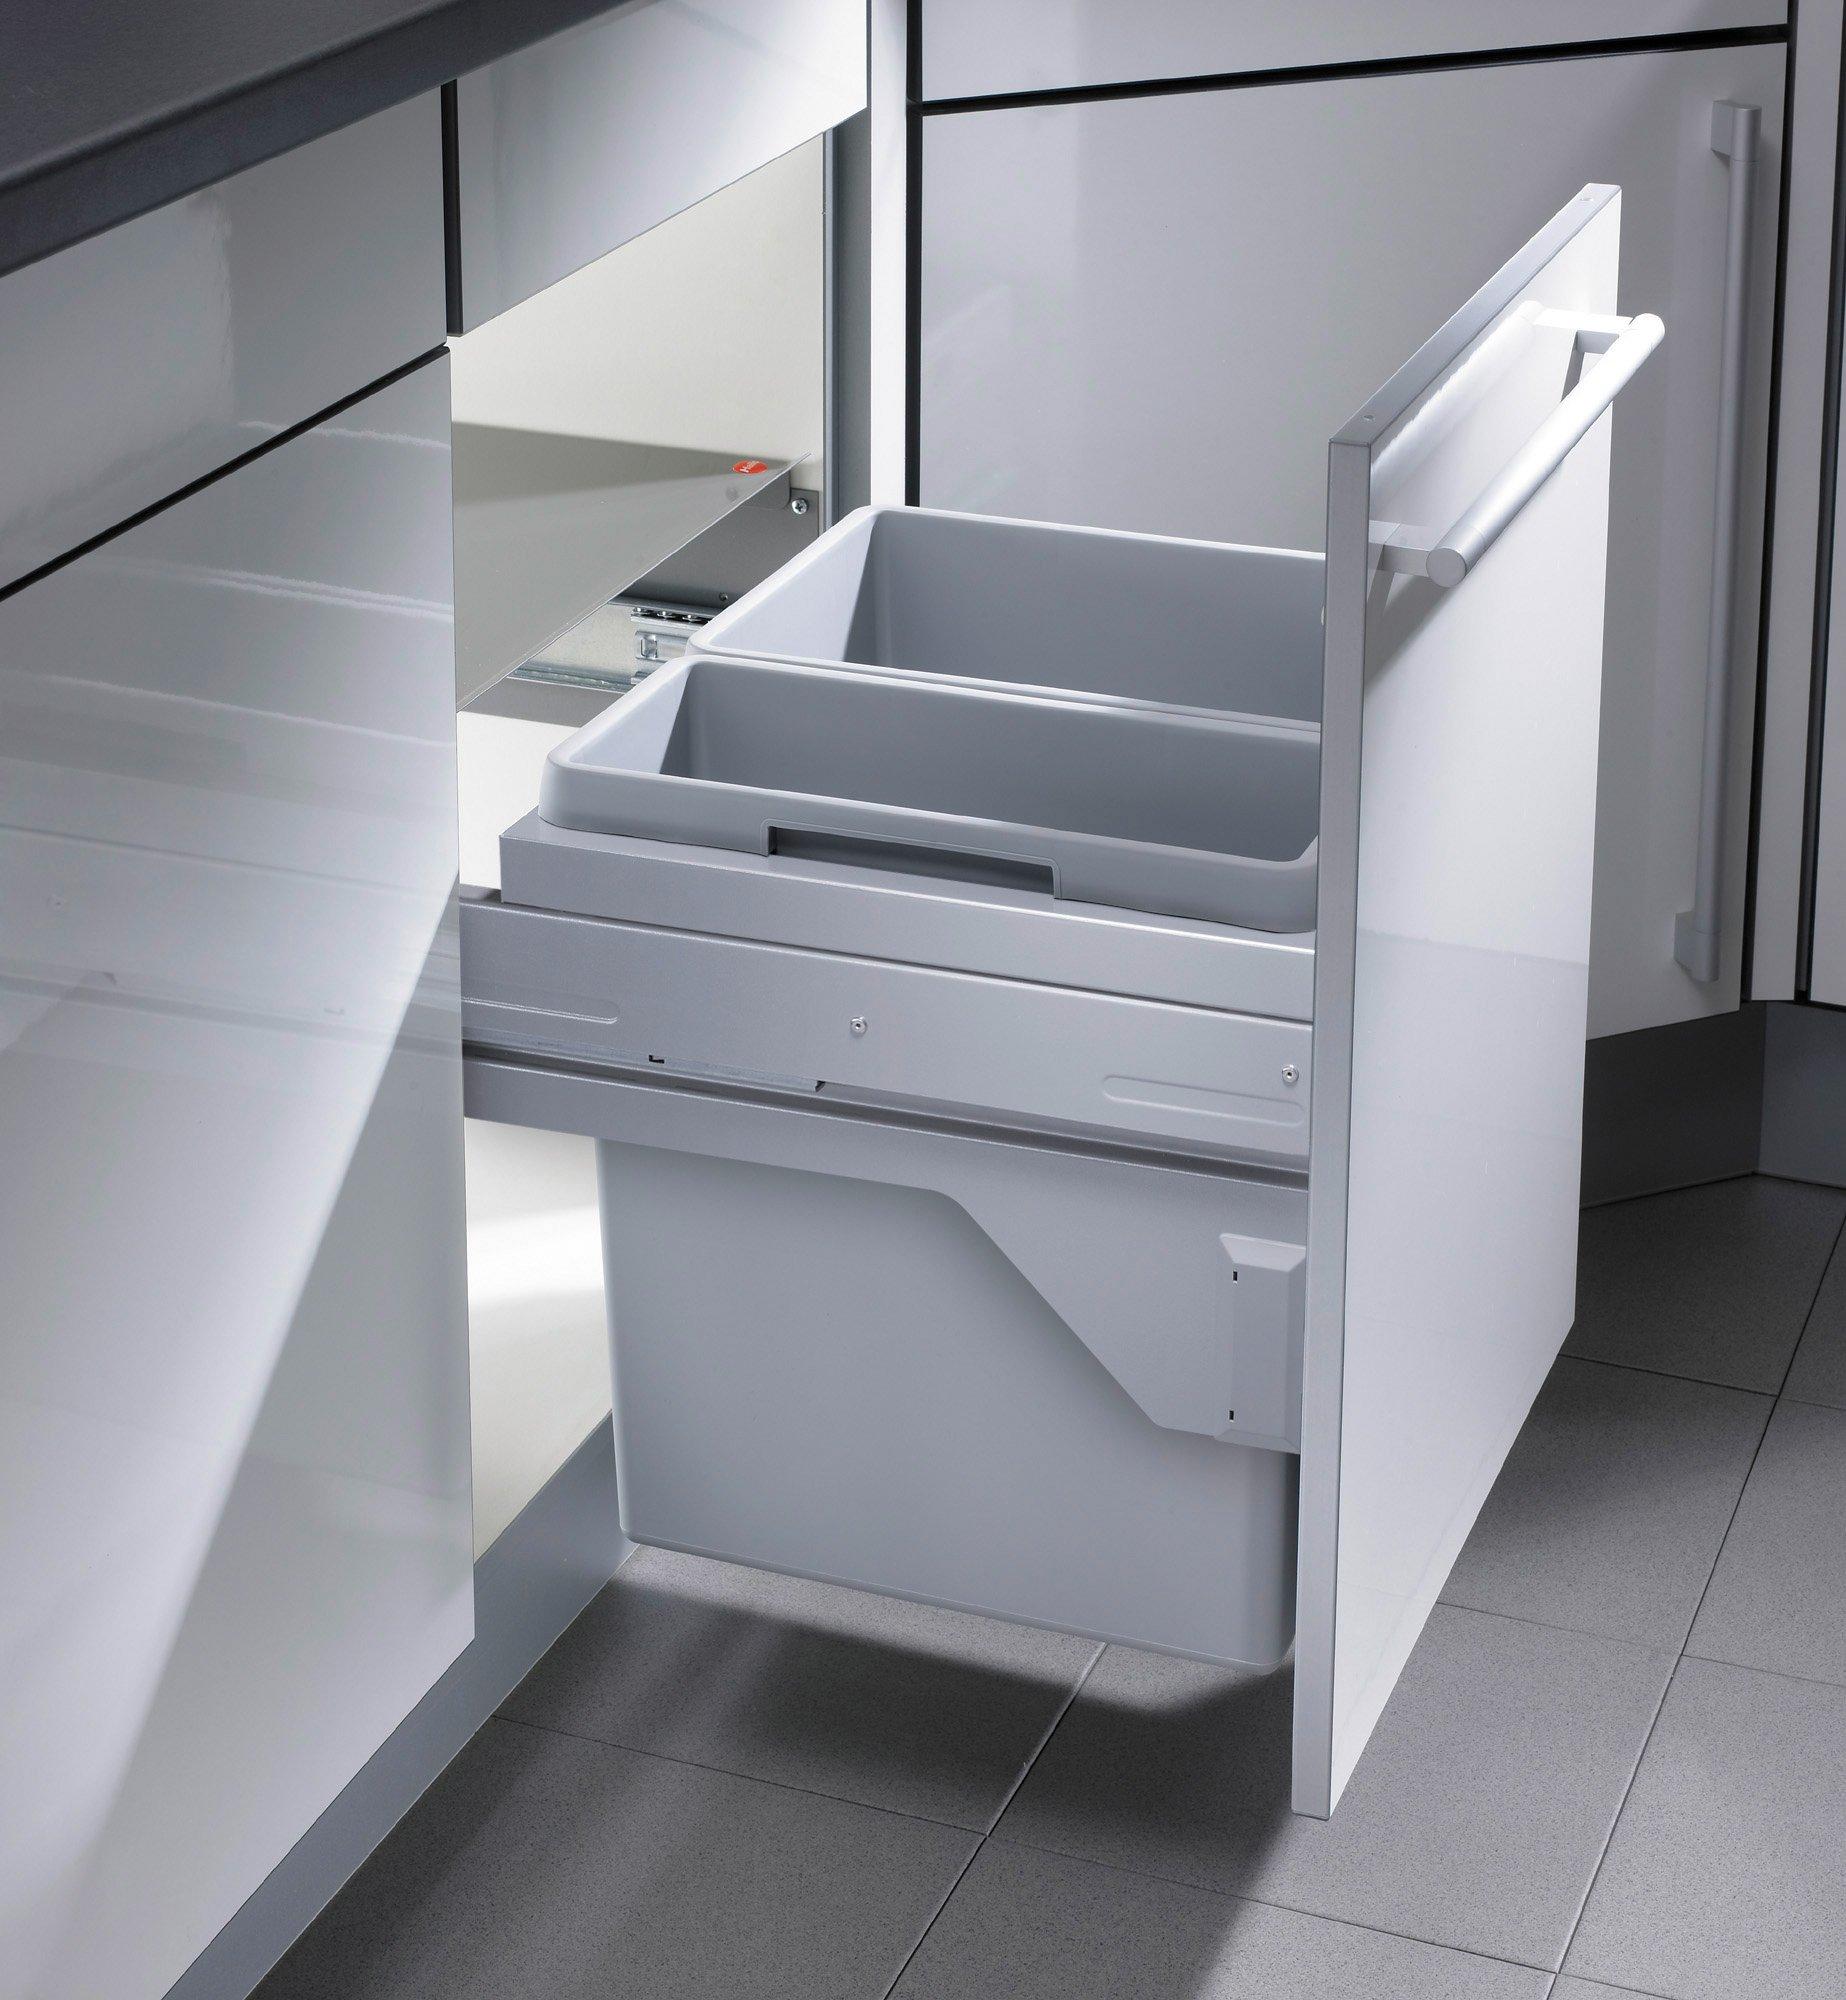 Hailo Euro Cargo S Küchen-Abfalleimer, Grau, One Size